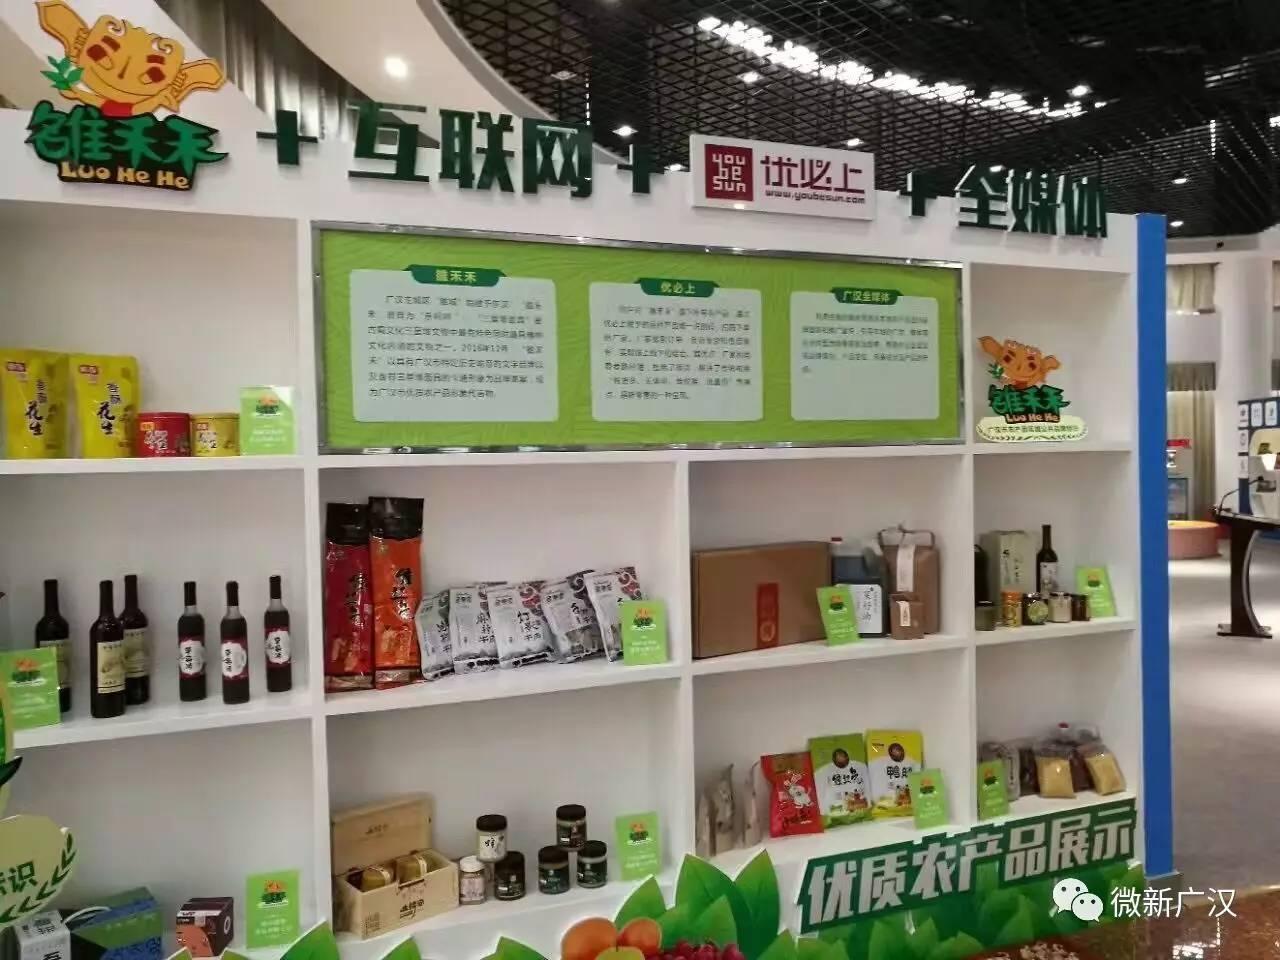 【ONE土建】广汉农产品起了个棒棒哒话题室内设计的知识名字图片